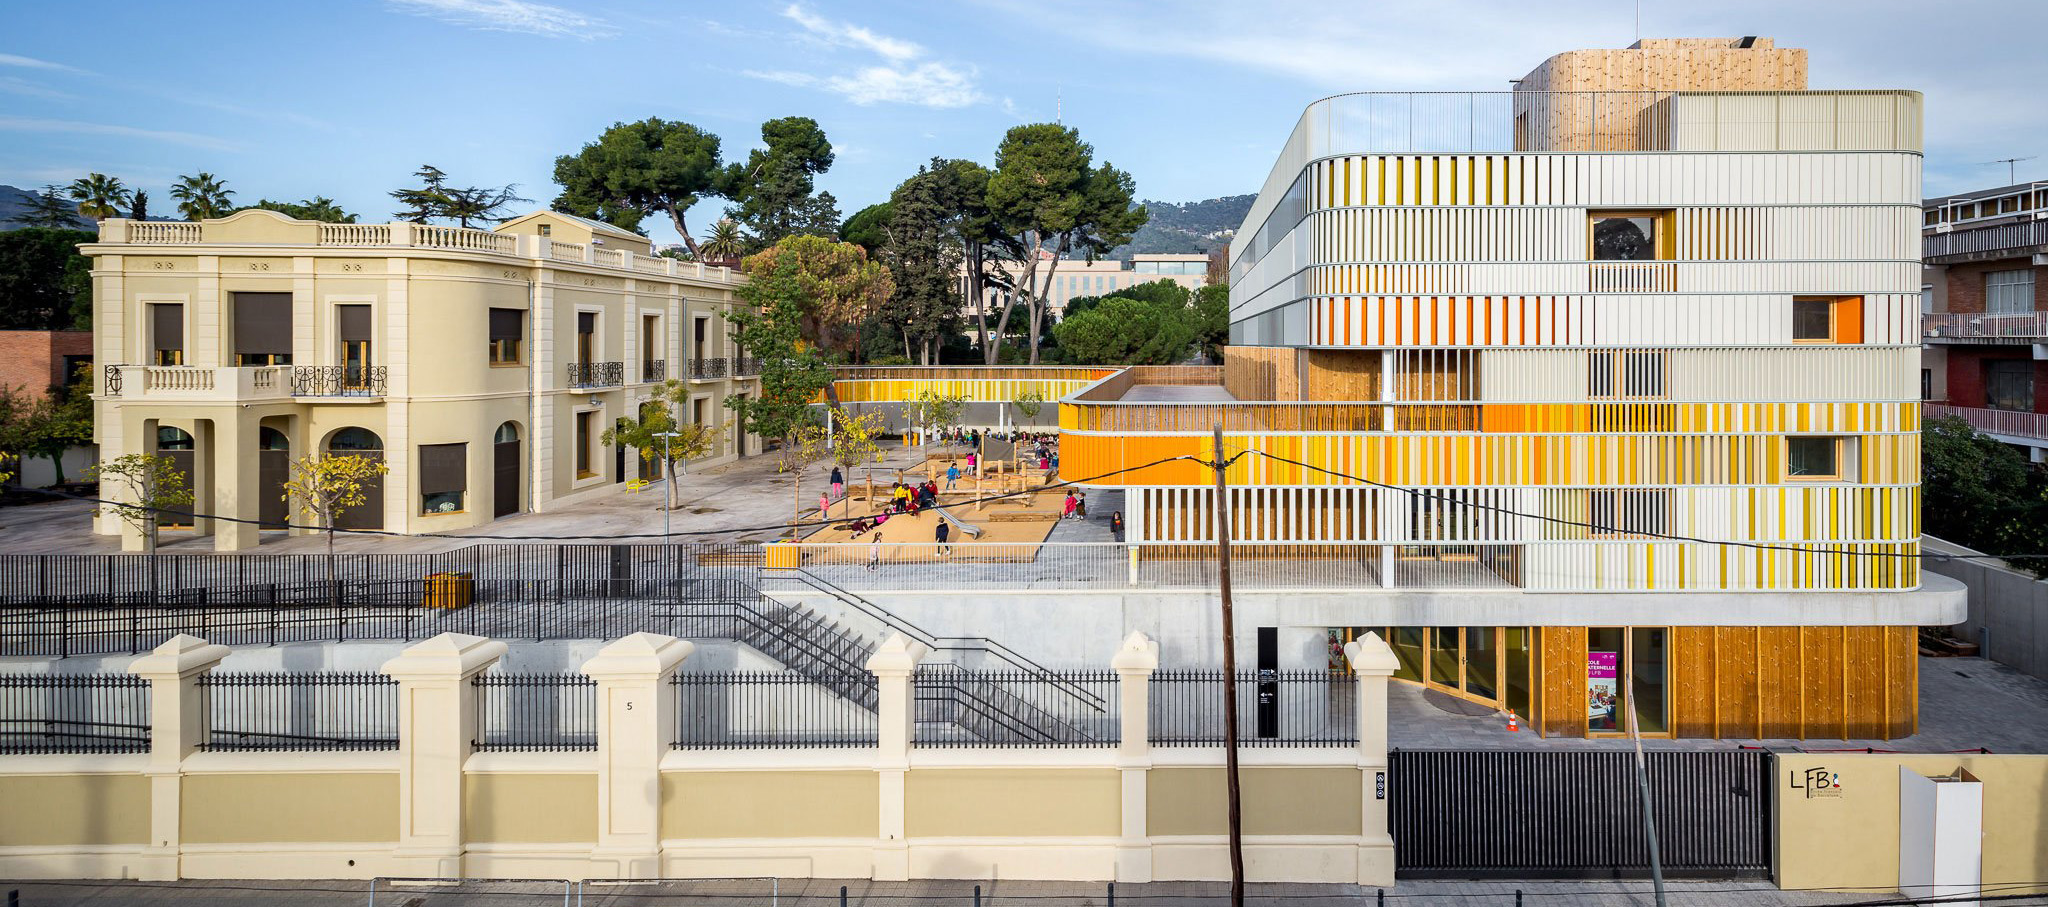 Lycée Français of Barcelona by b720 Fermín Vázquez Arquitectos. Photograph © Simón García